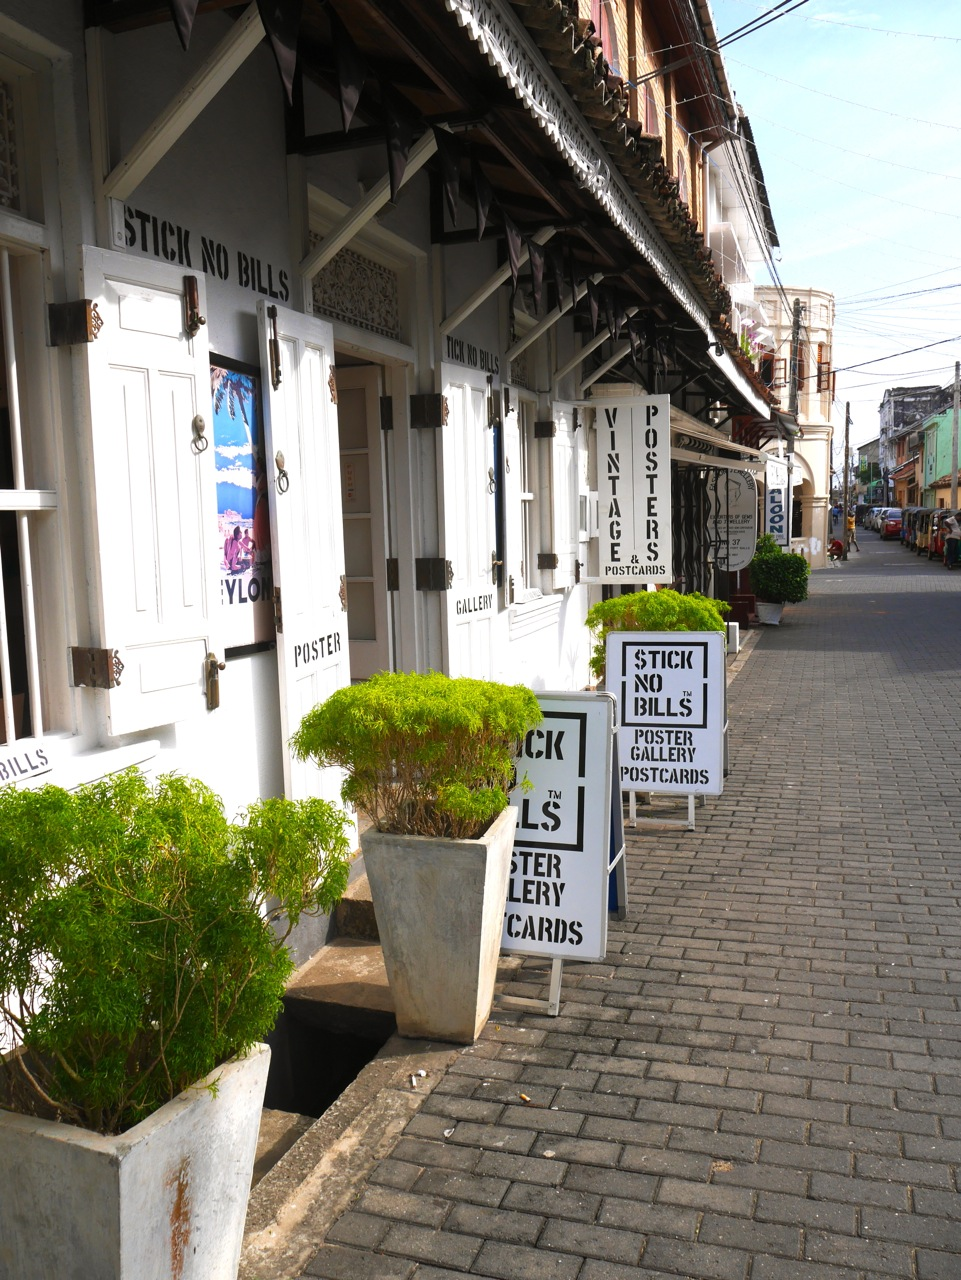 Sri Lanka Galle old City sticknobills